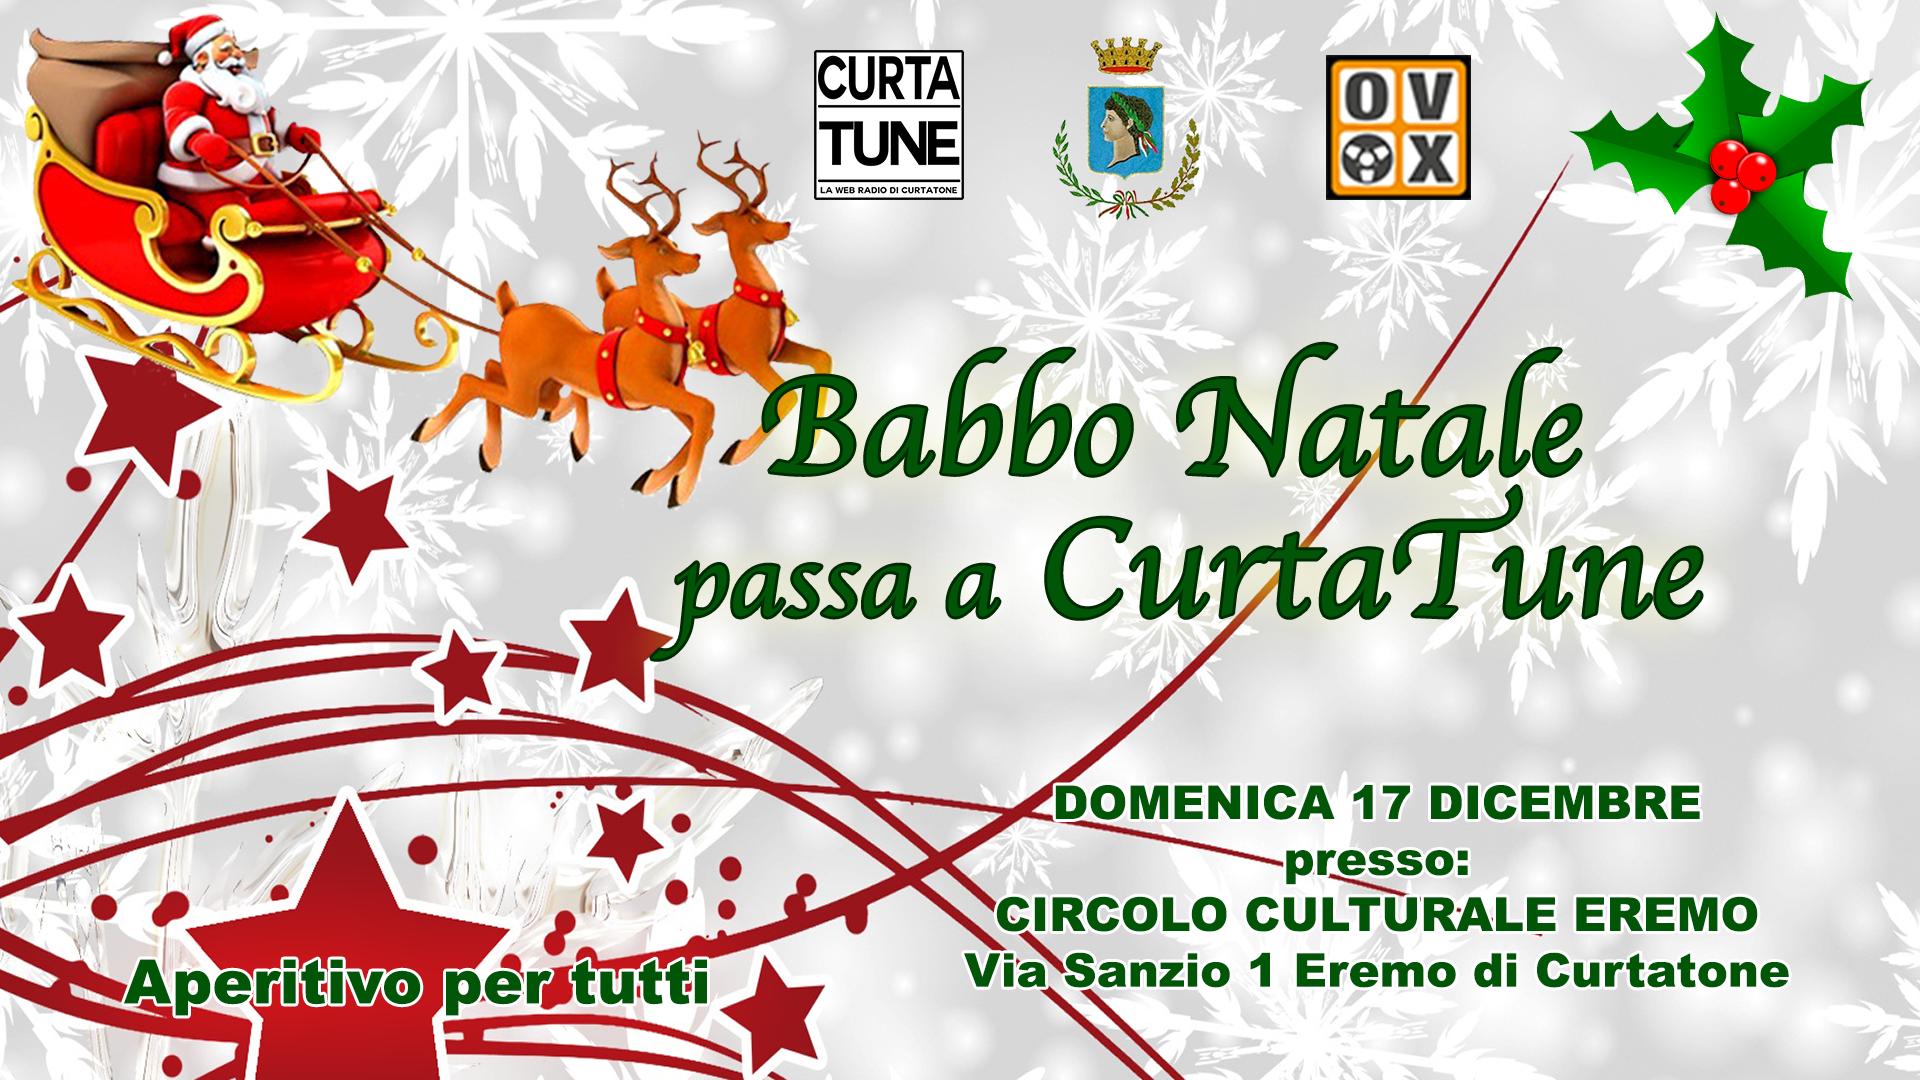 BABBO NATALE PASSA DA CURTATONE!